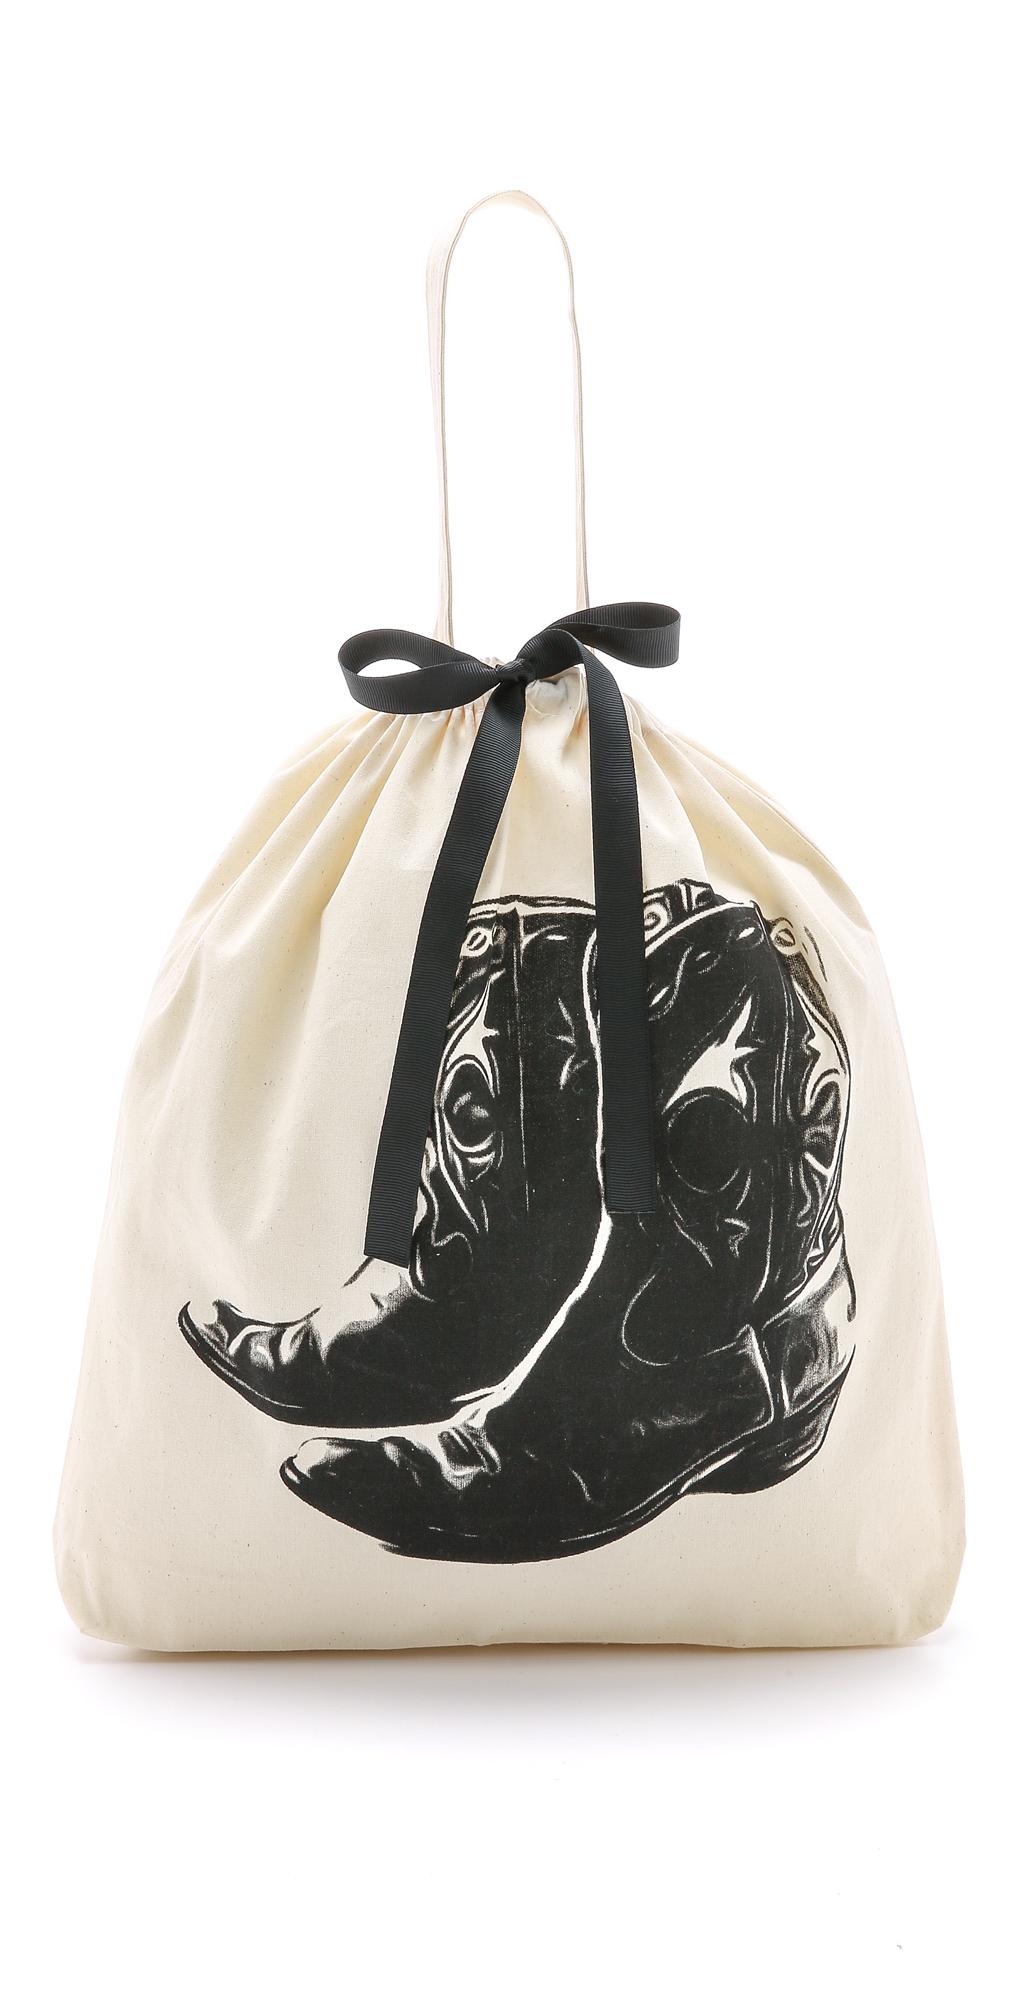 Cowboy Boot Organizing Bag Bag-all